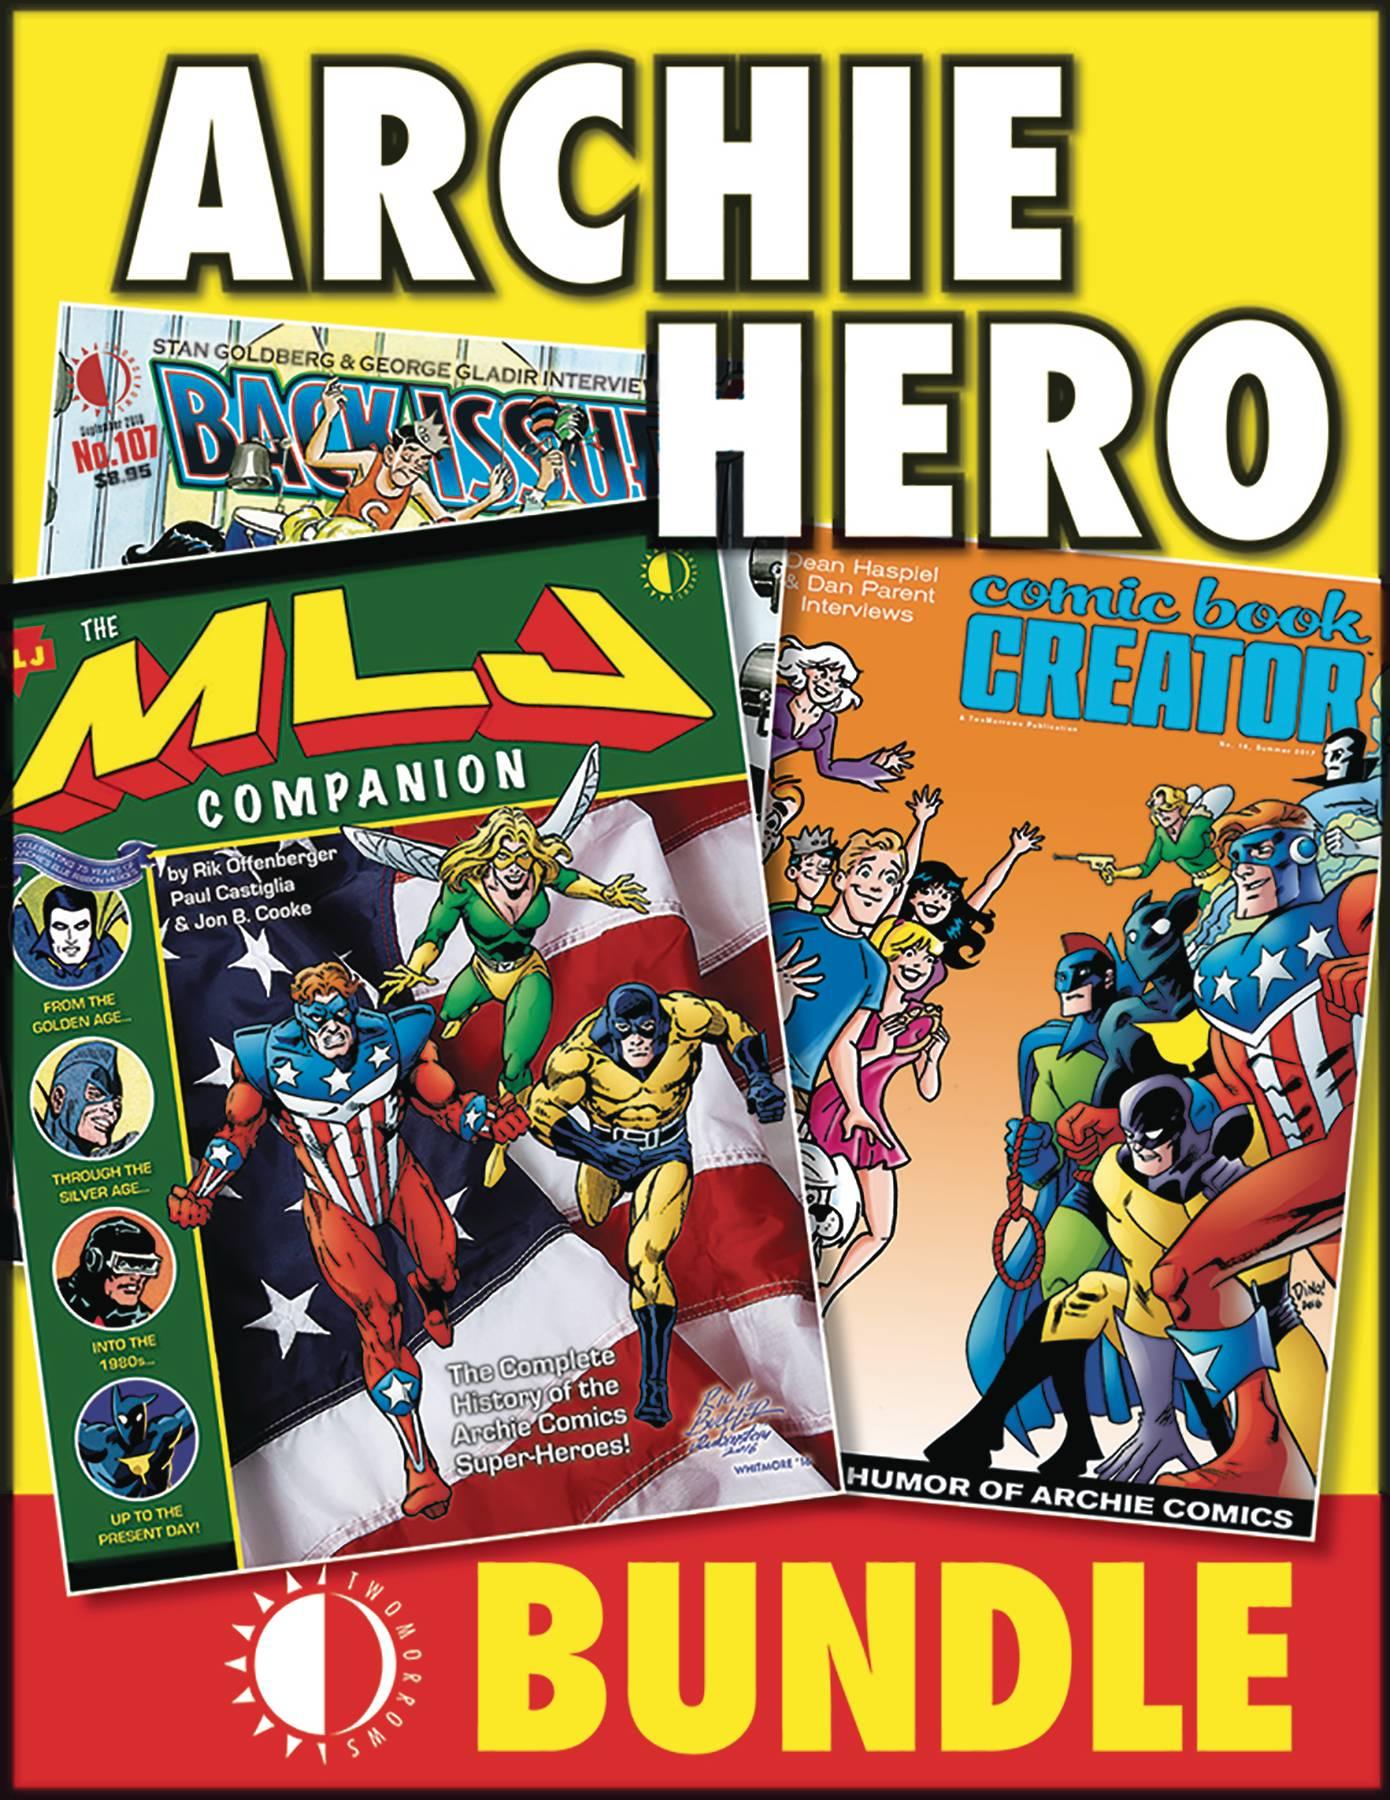 ARCHIE HERO BUNDLE